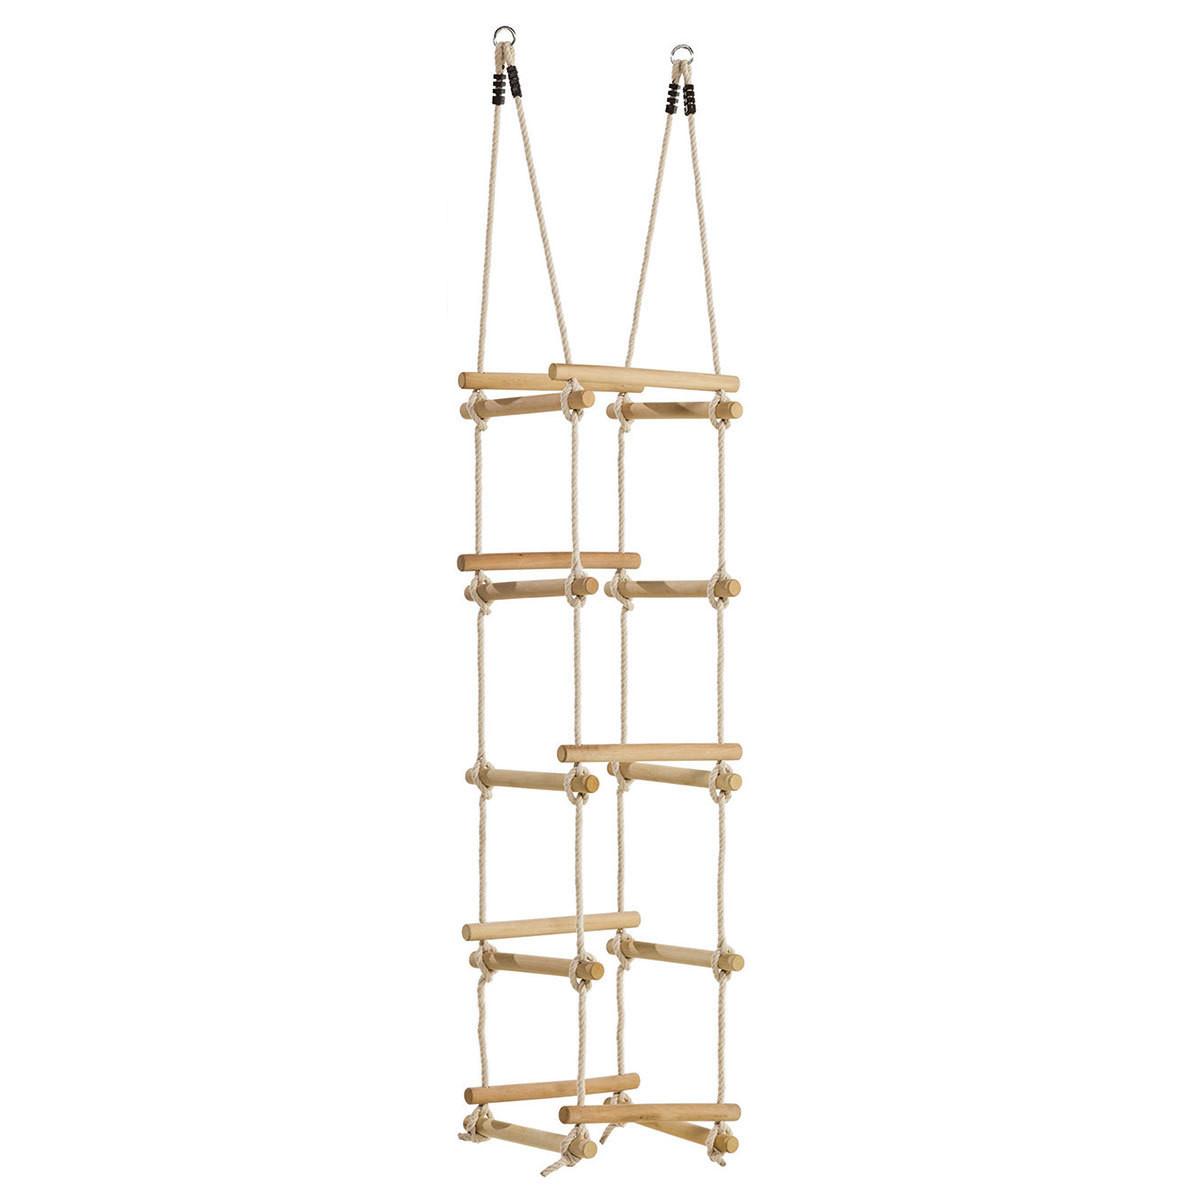 Мотузкова драбинка на 4 сторони для дитячого майданчика